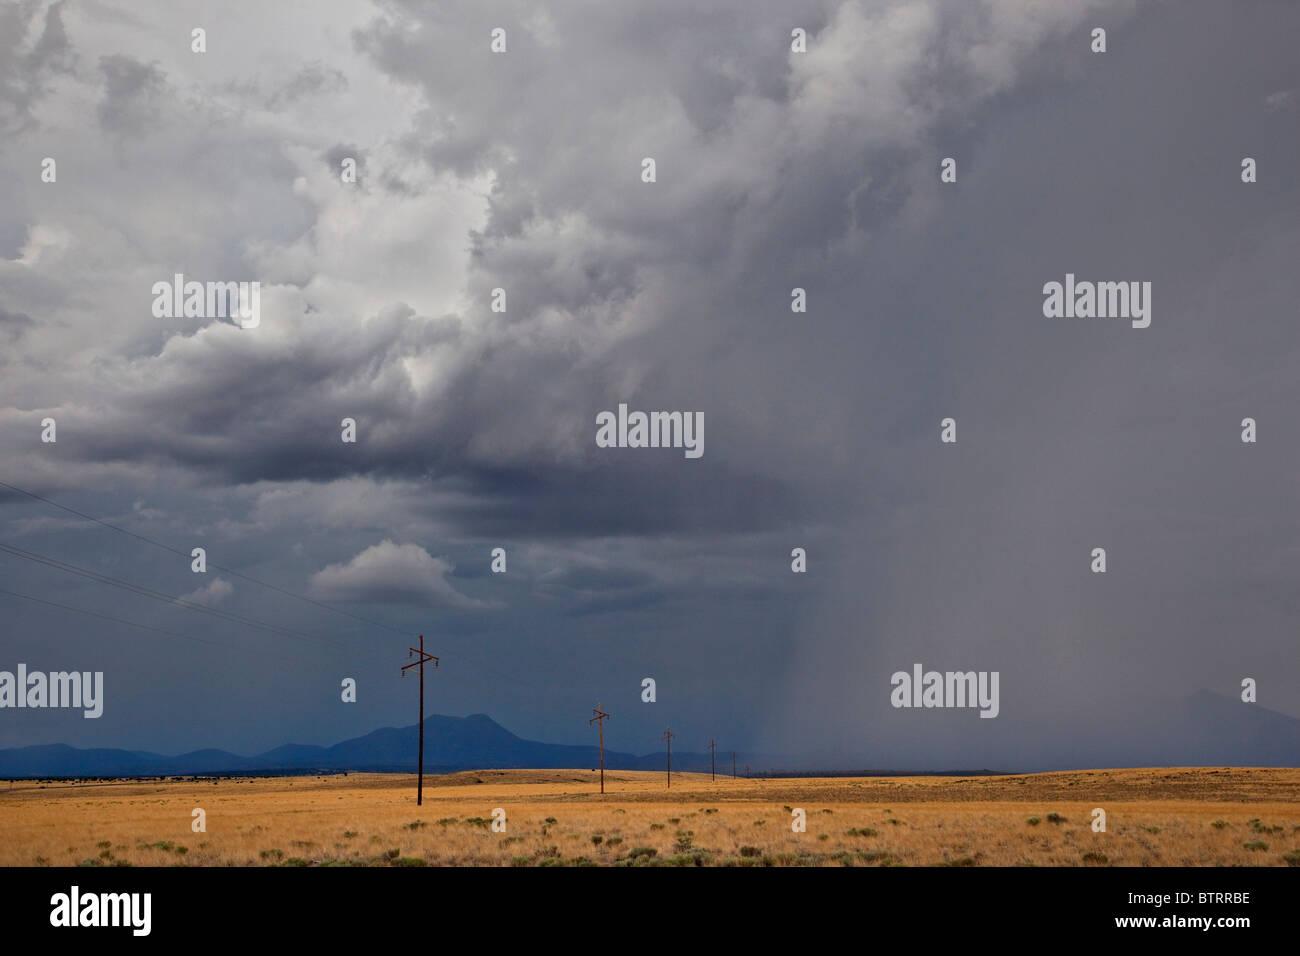 Summer thunderstorm over grasslands near Highway 89 at Gray Mountain, Coconino County, Arizona, USA - Stock Image